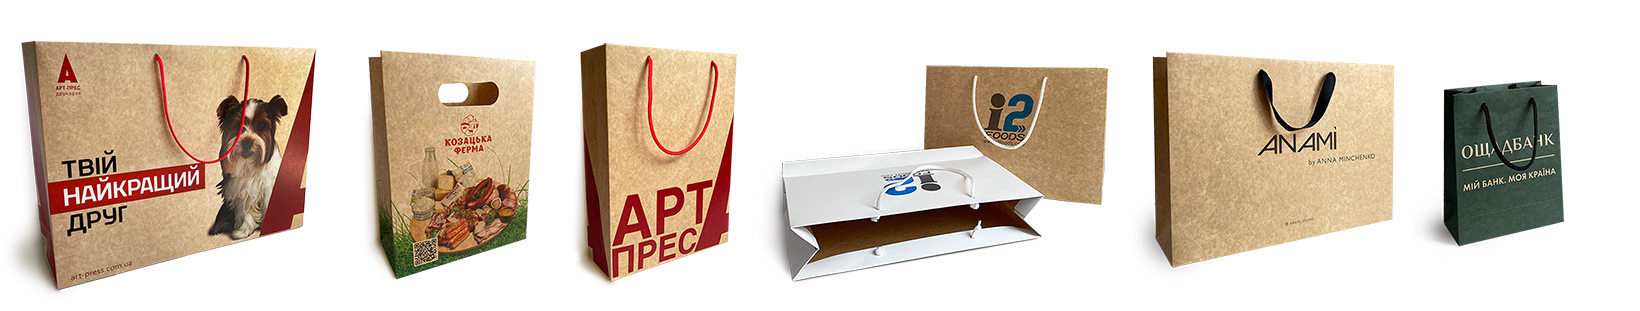 Пакеты из крафт-картона